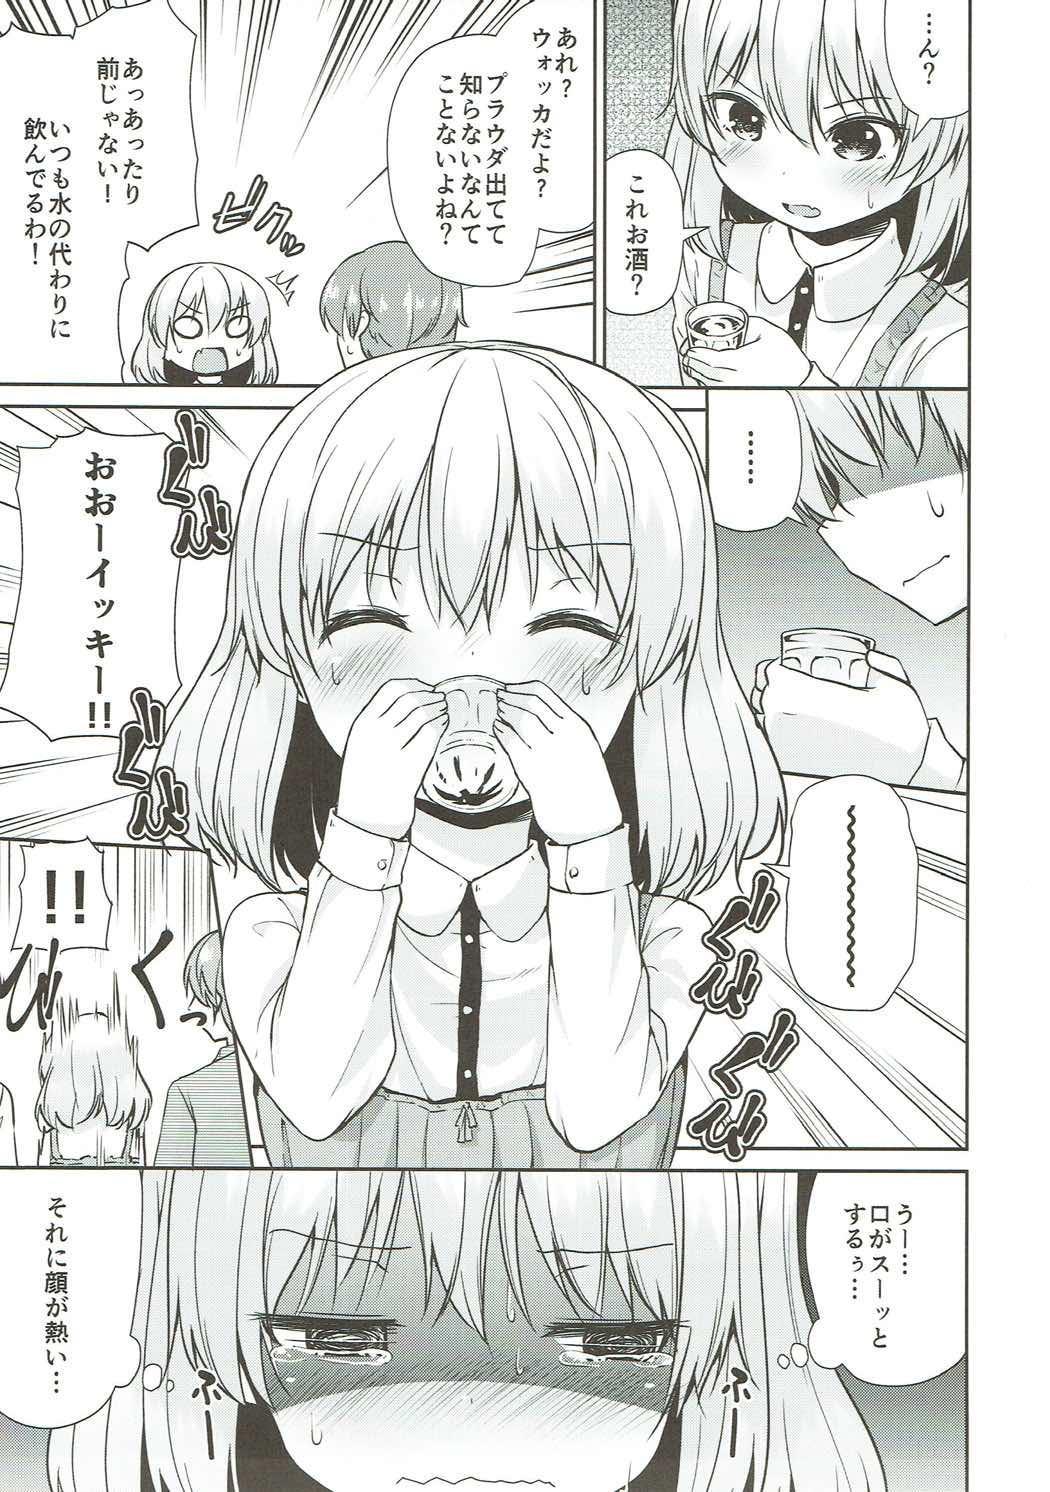 Katyusha Marugaku Ichinensei 3